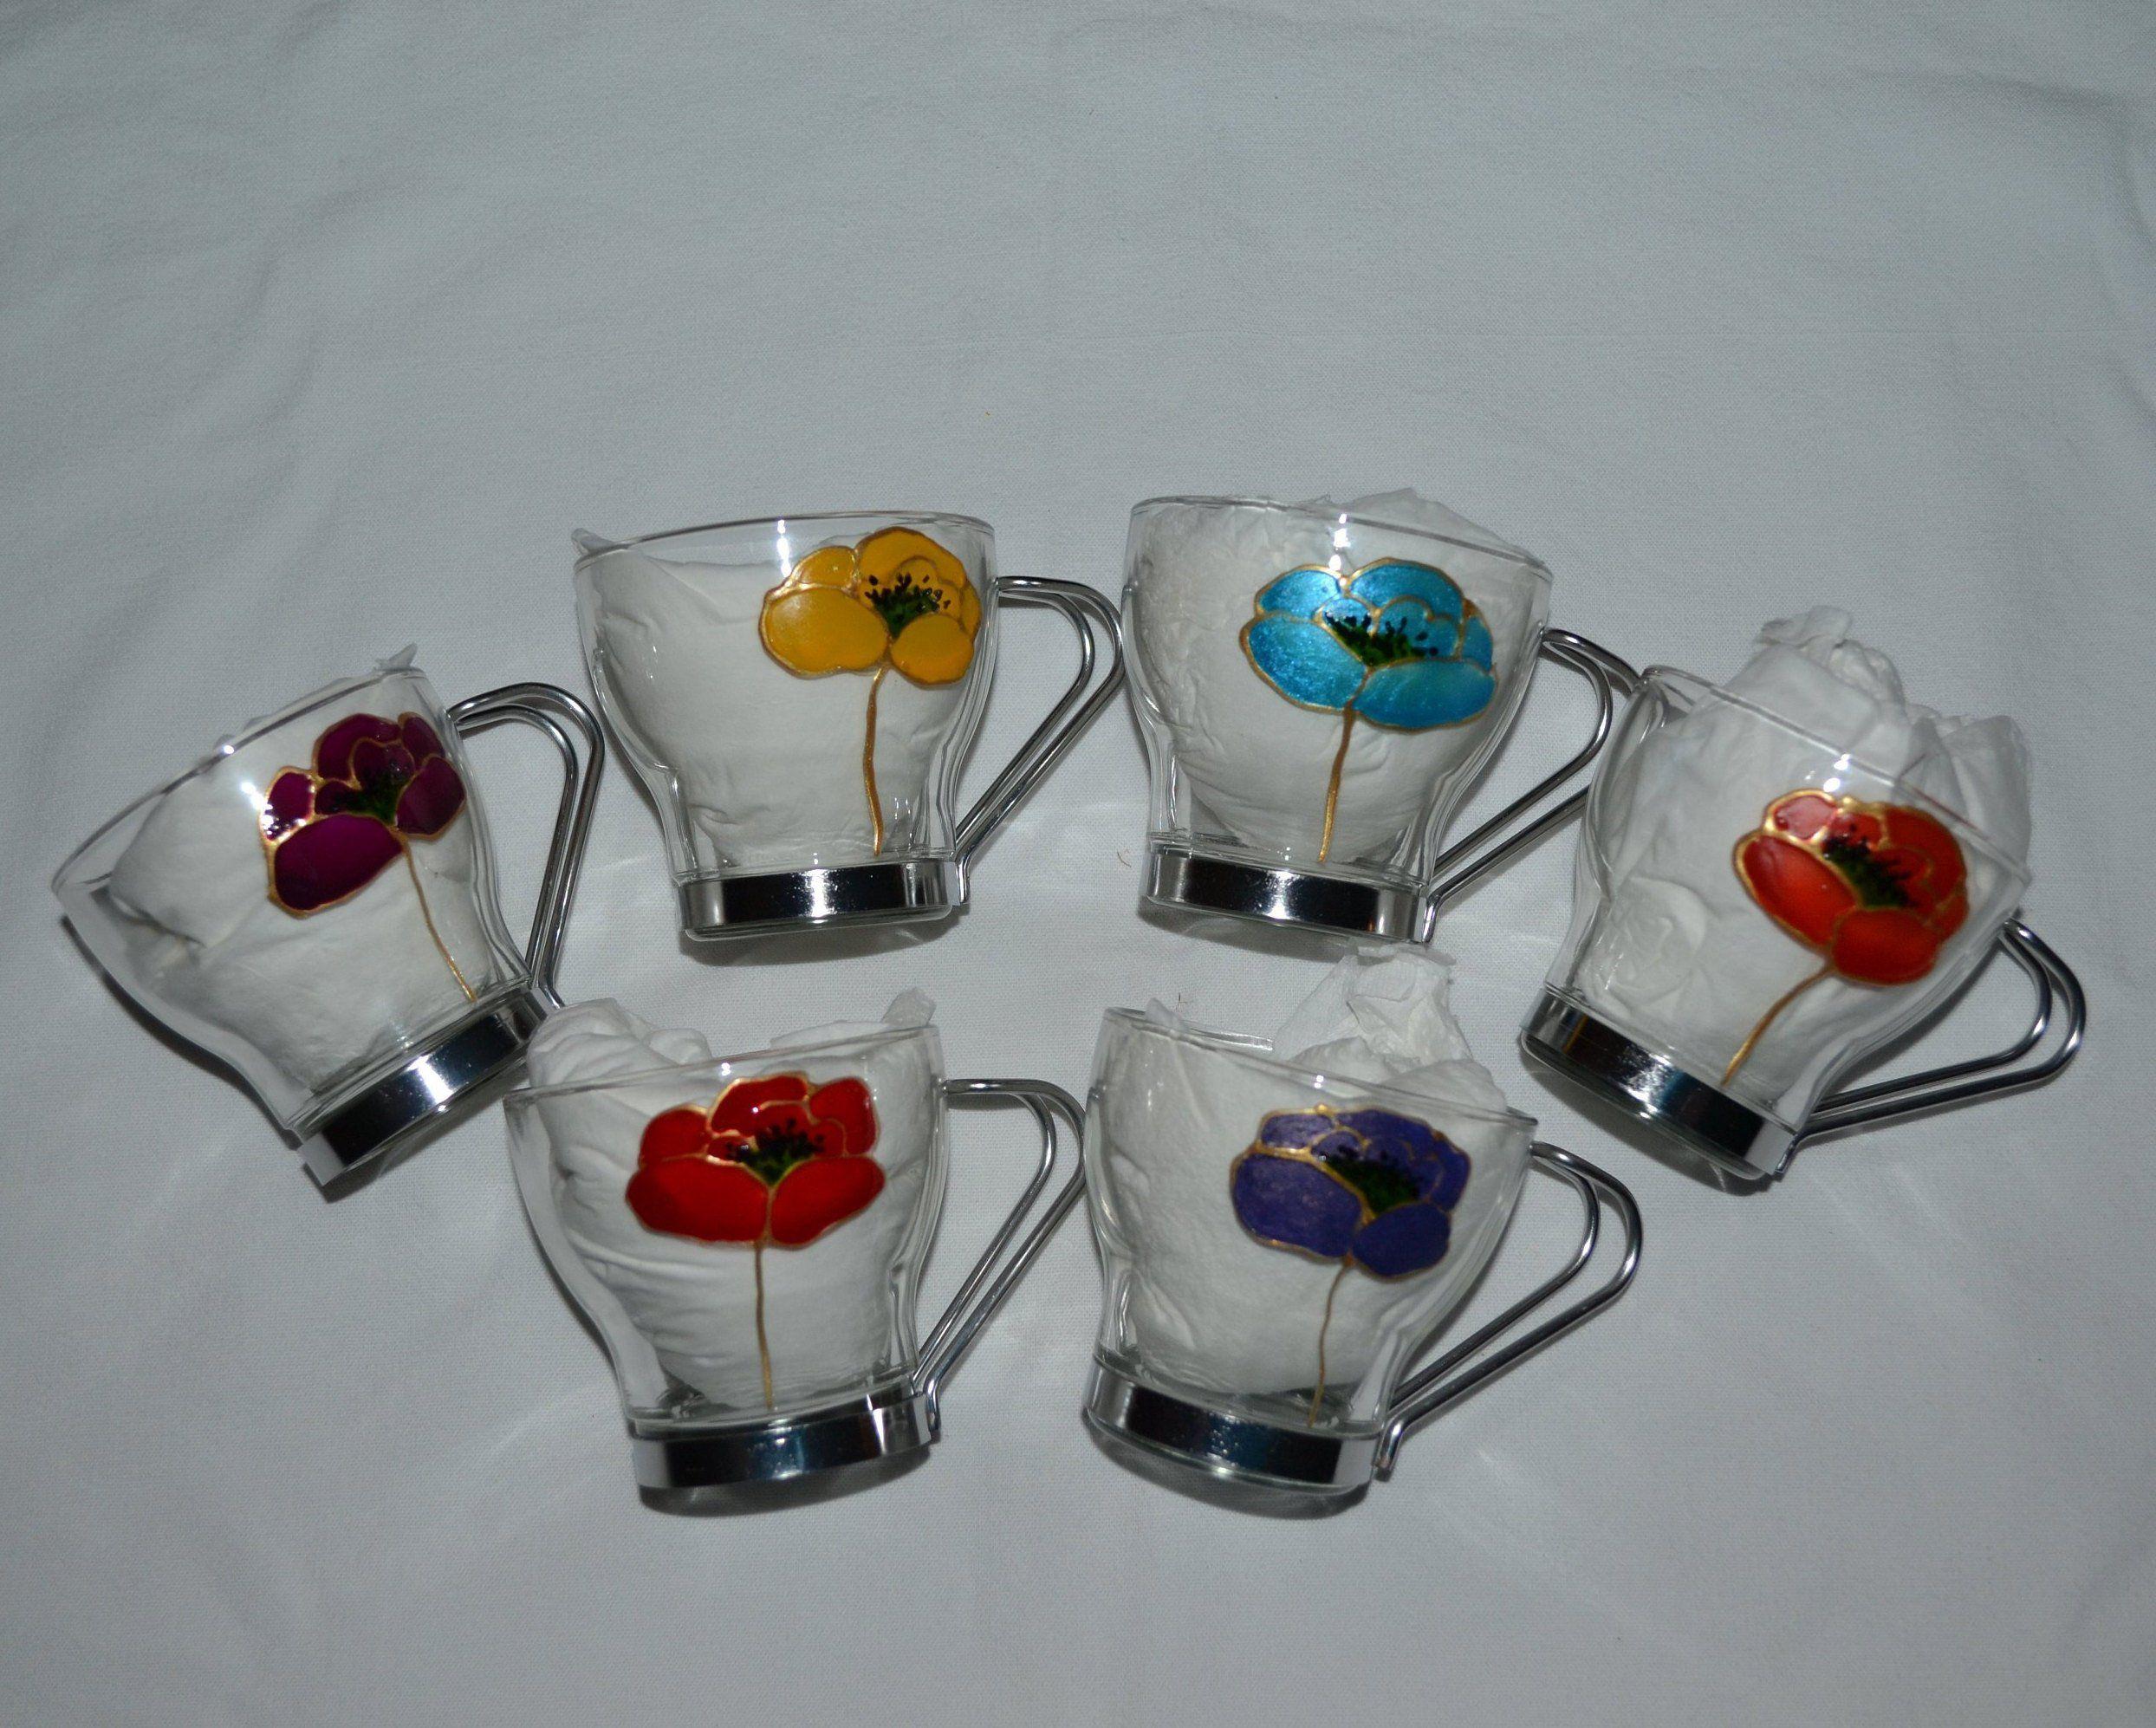 6 Tasses Caf ,Tasses Expresso,Tasses Th ,En Verre Peint Coquelicots